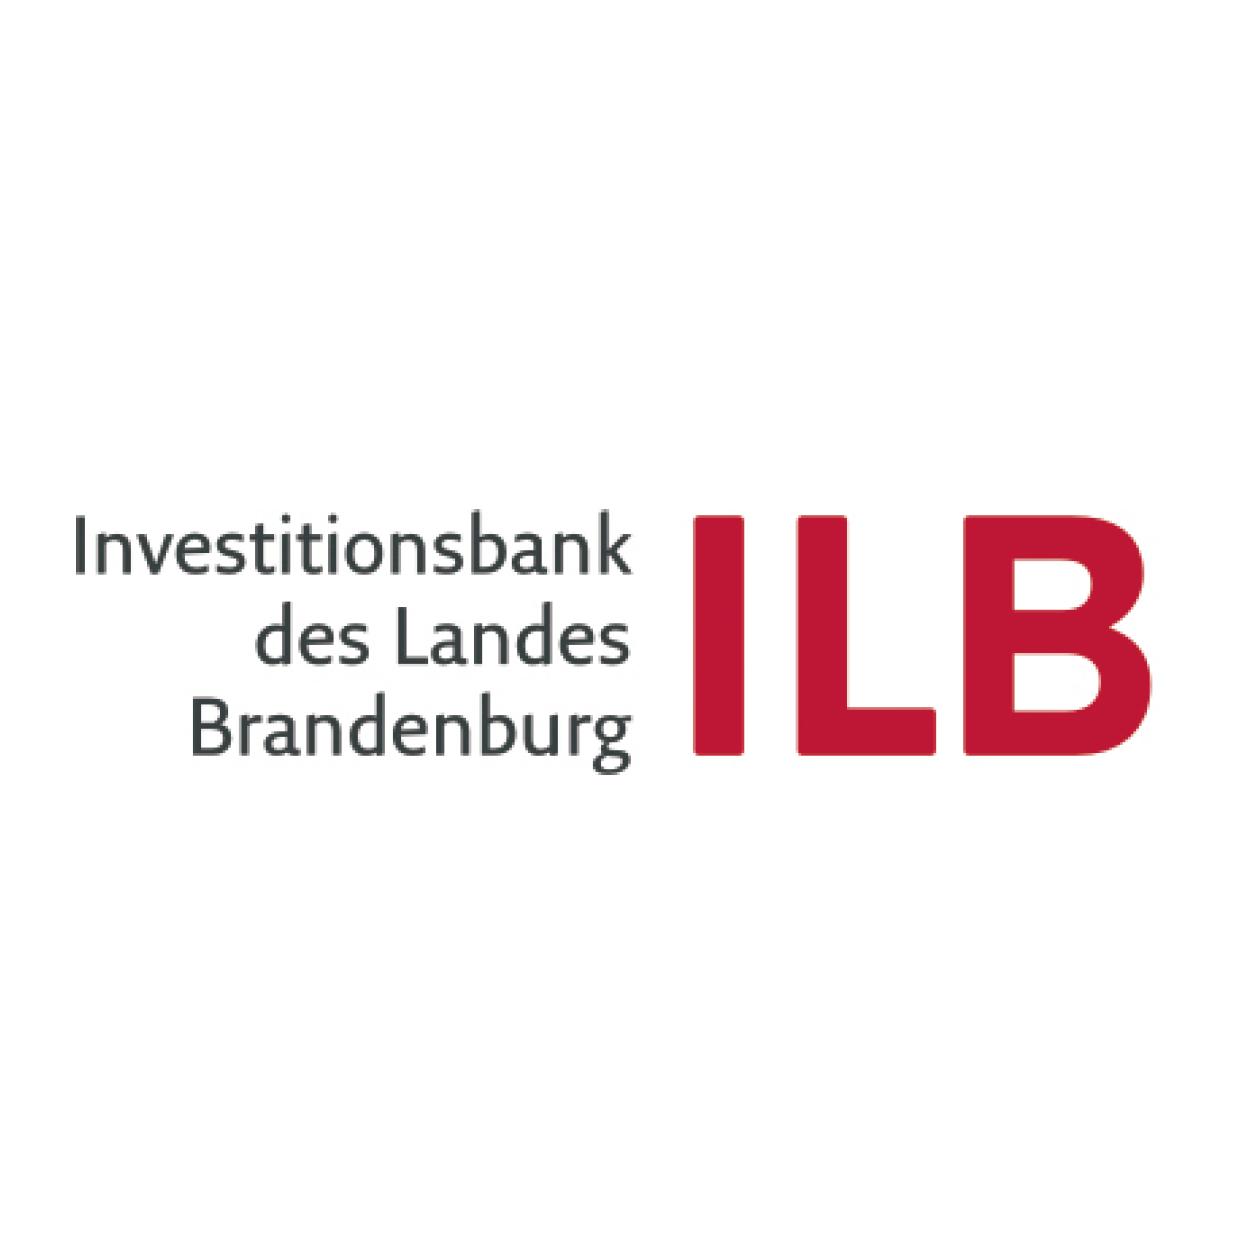 Investitionsbank des Landes Brandenburg